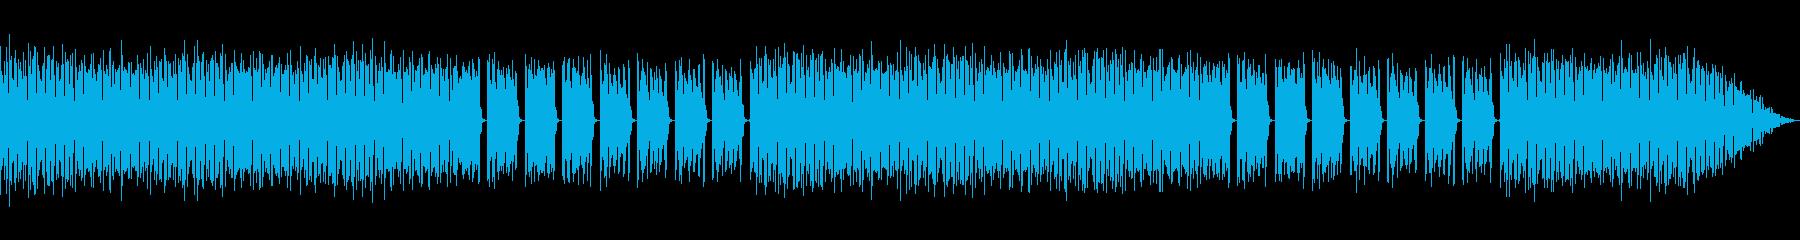 Ainu Mookuri comical scene's reproduced waveform